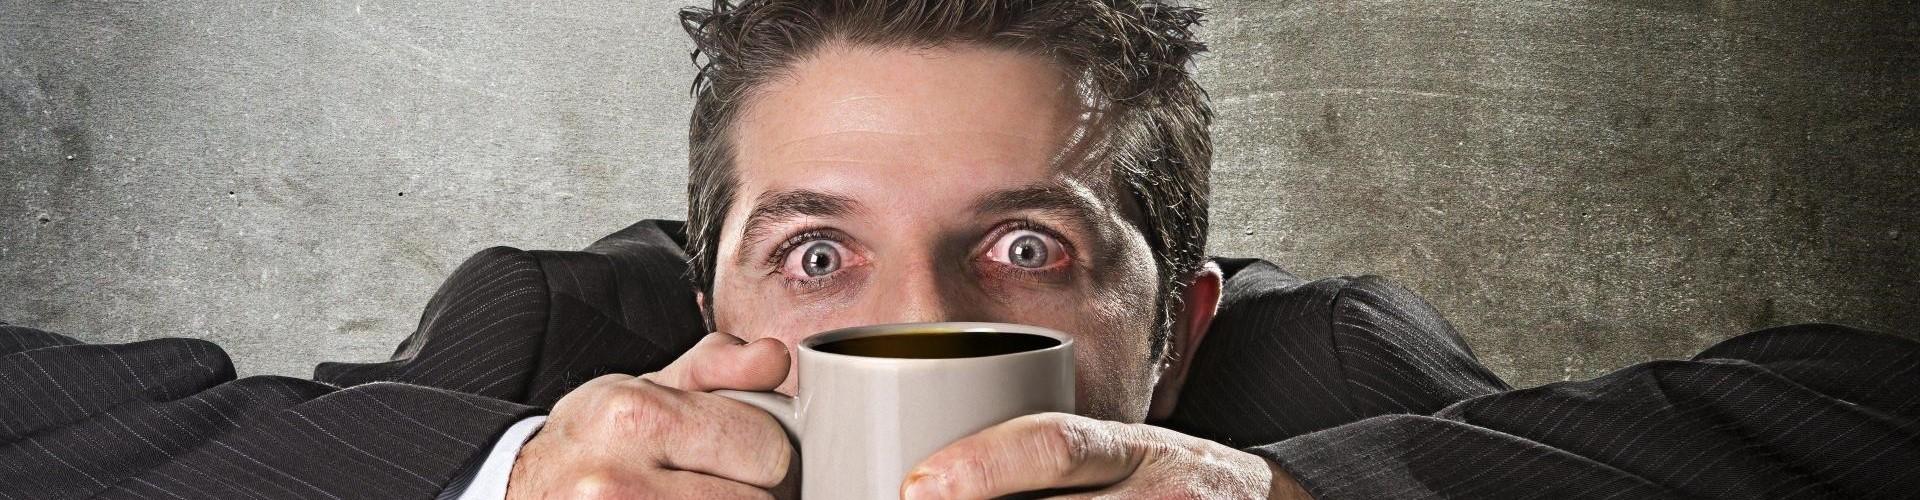 How to Get Rid of Coffee Jitters - Reasons & Helpful Advice